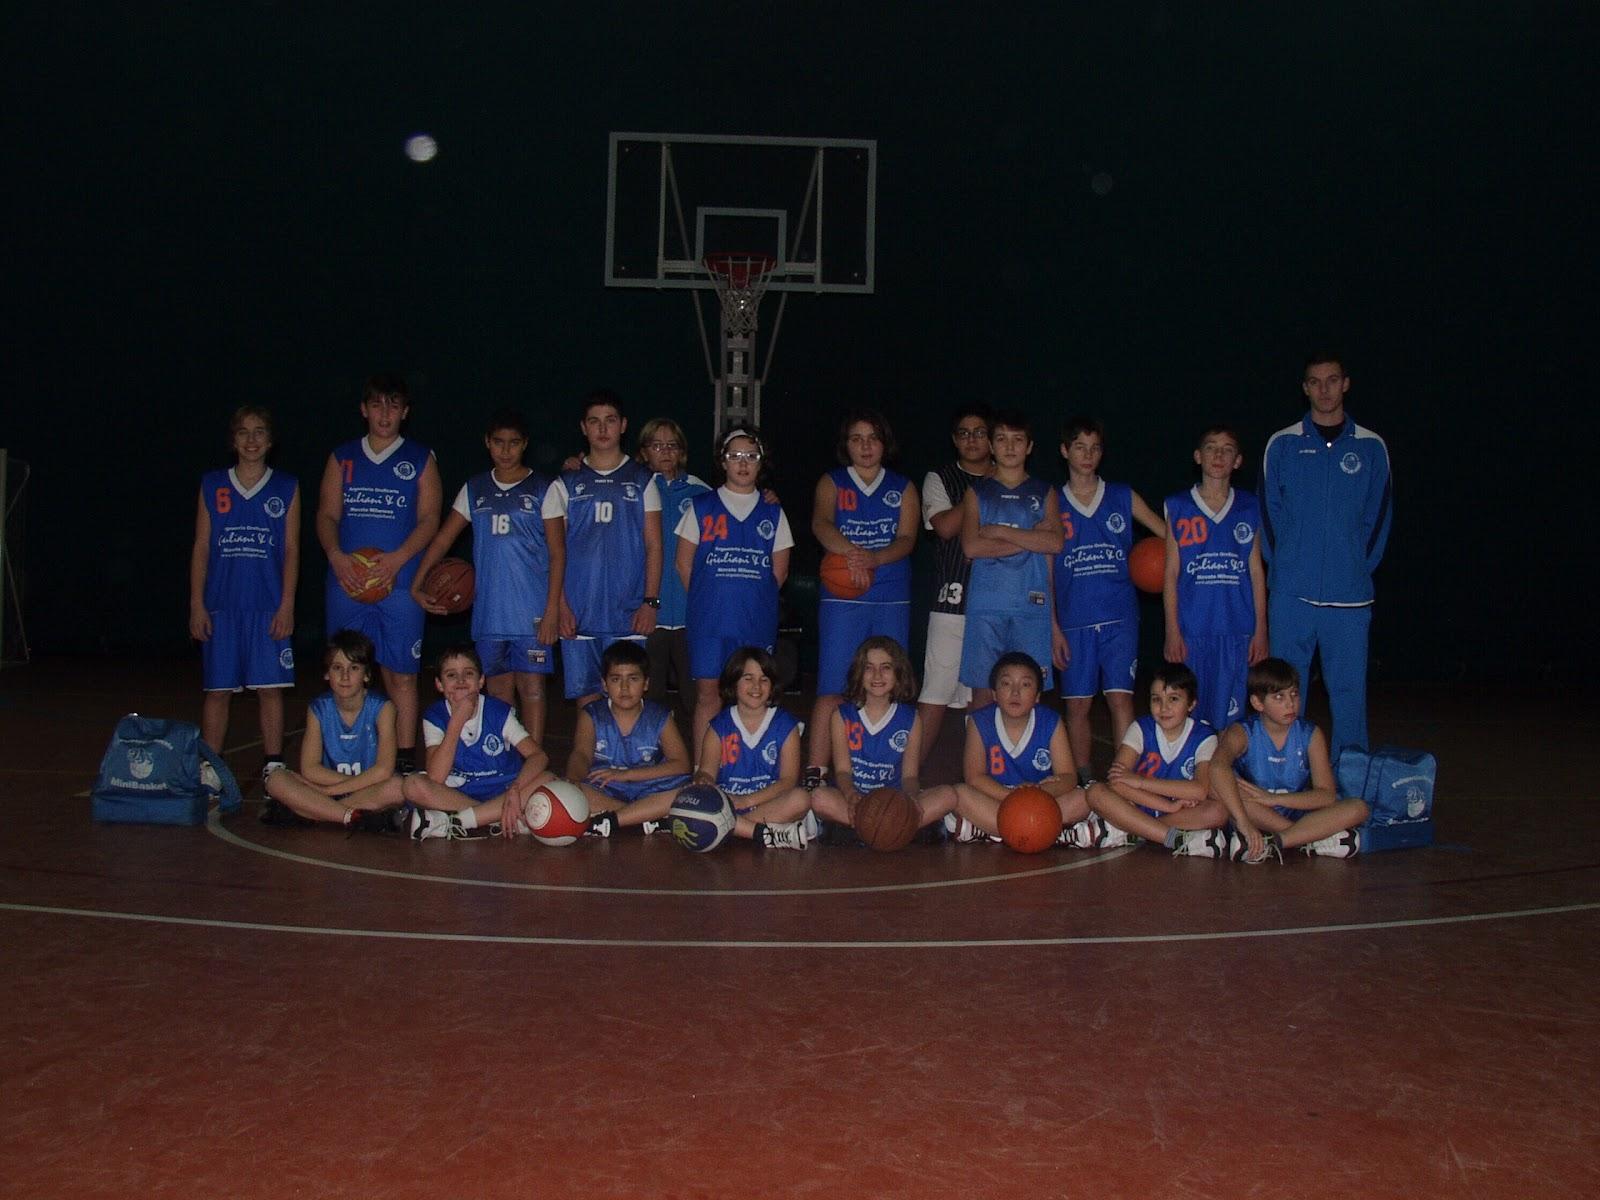 Scuola Media Vergani Novate Milanese.Polisportiva Novate Basket Minibasket Finalmente Torniamo A